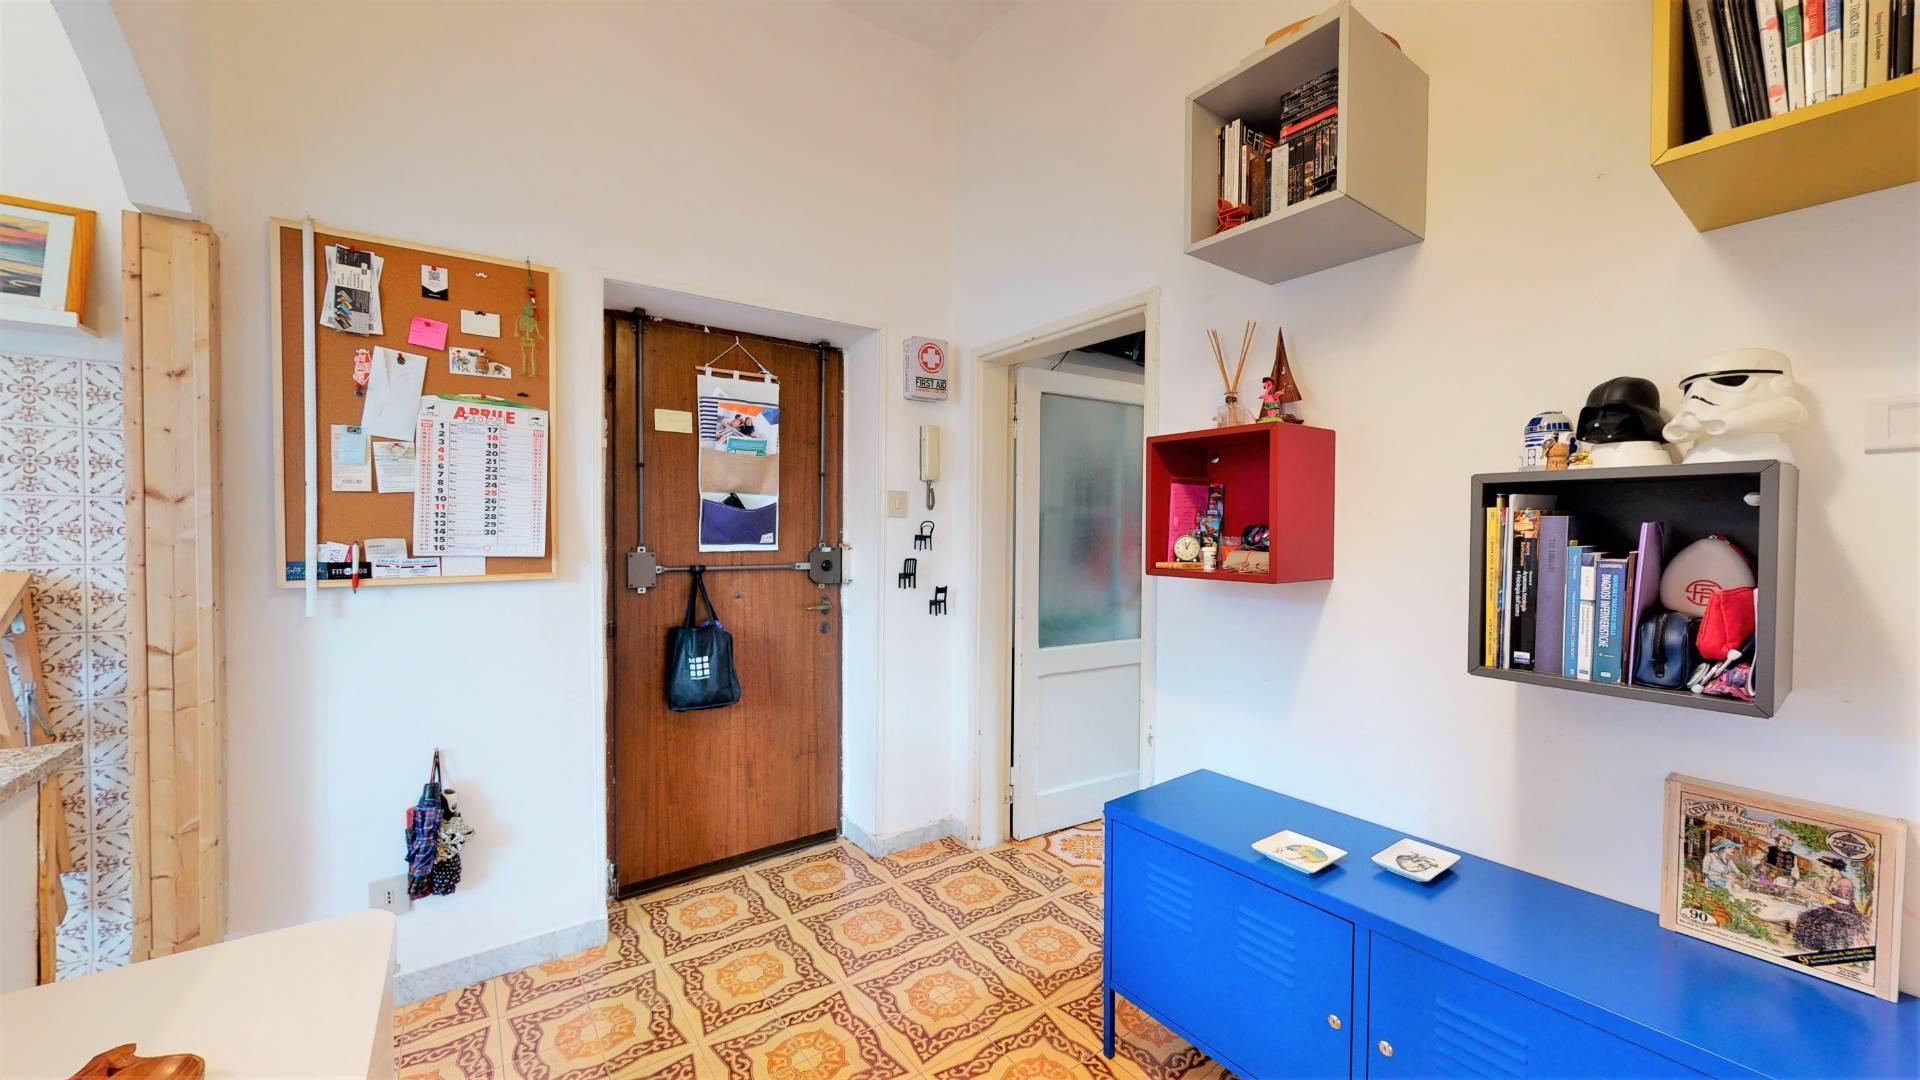 1118419775 Bilocale in Via Giuseppe Bellucci, Roma, Zona Casal De Pazzi